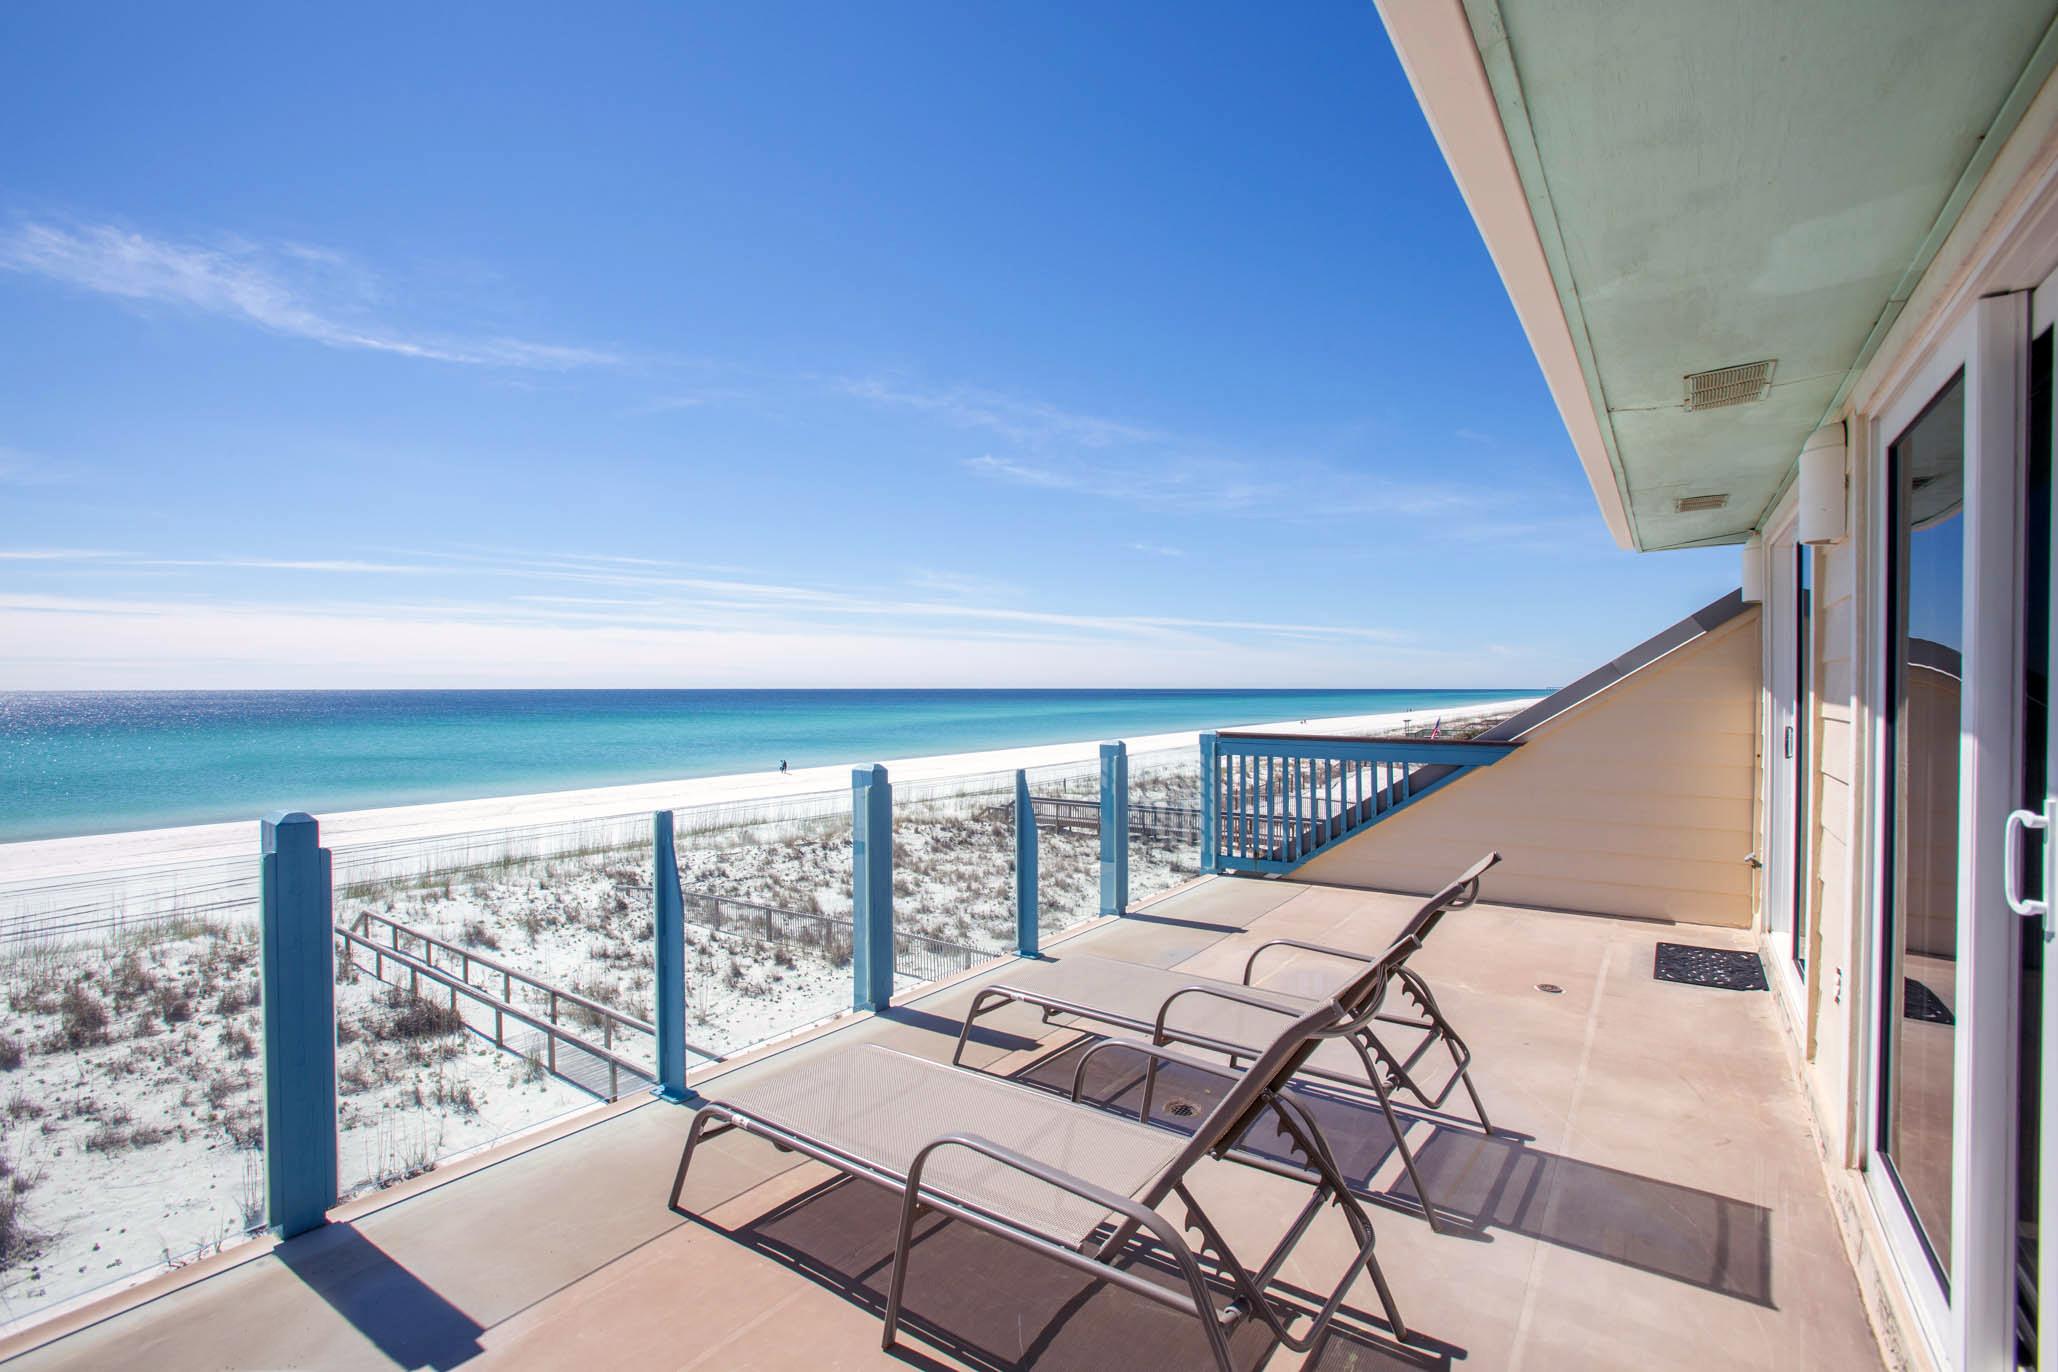 Ariola 1214 House/Cottage rental in Luxury Homes in Pensacola Beach Florida - #31